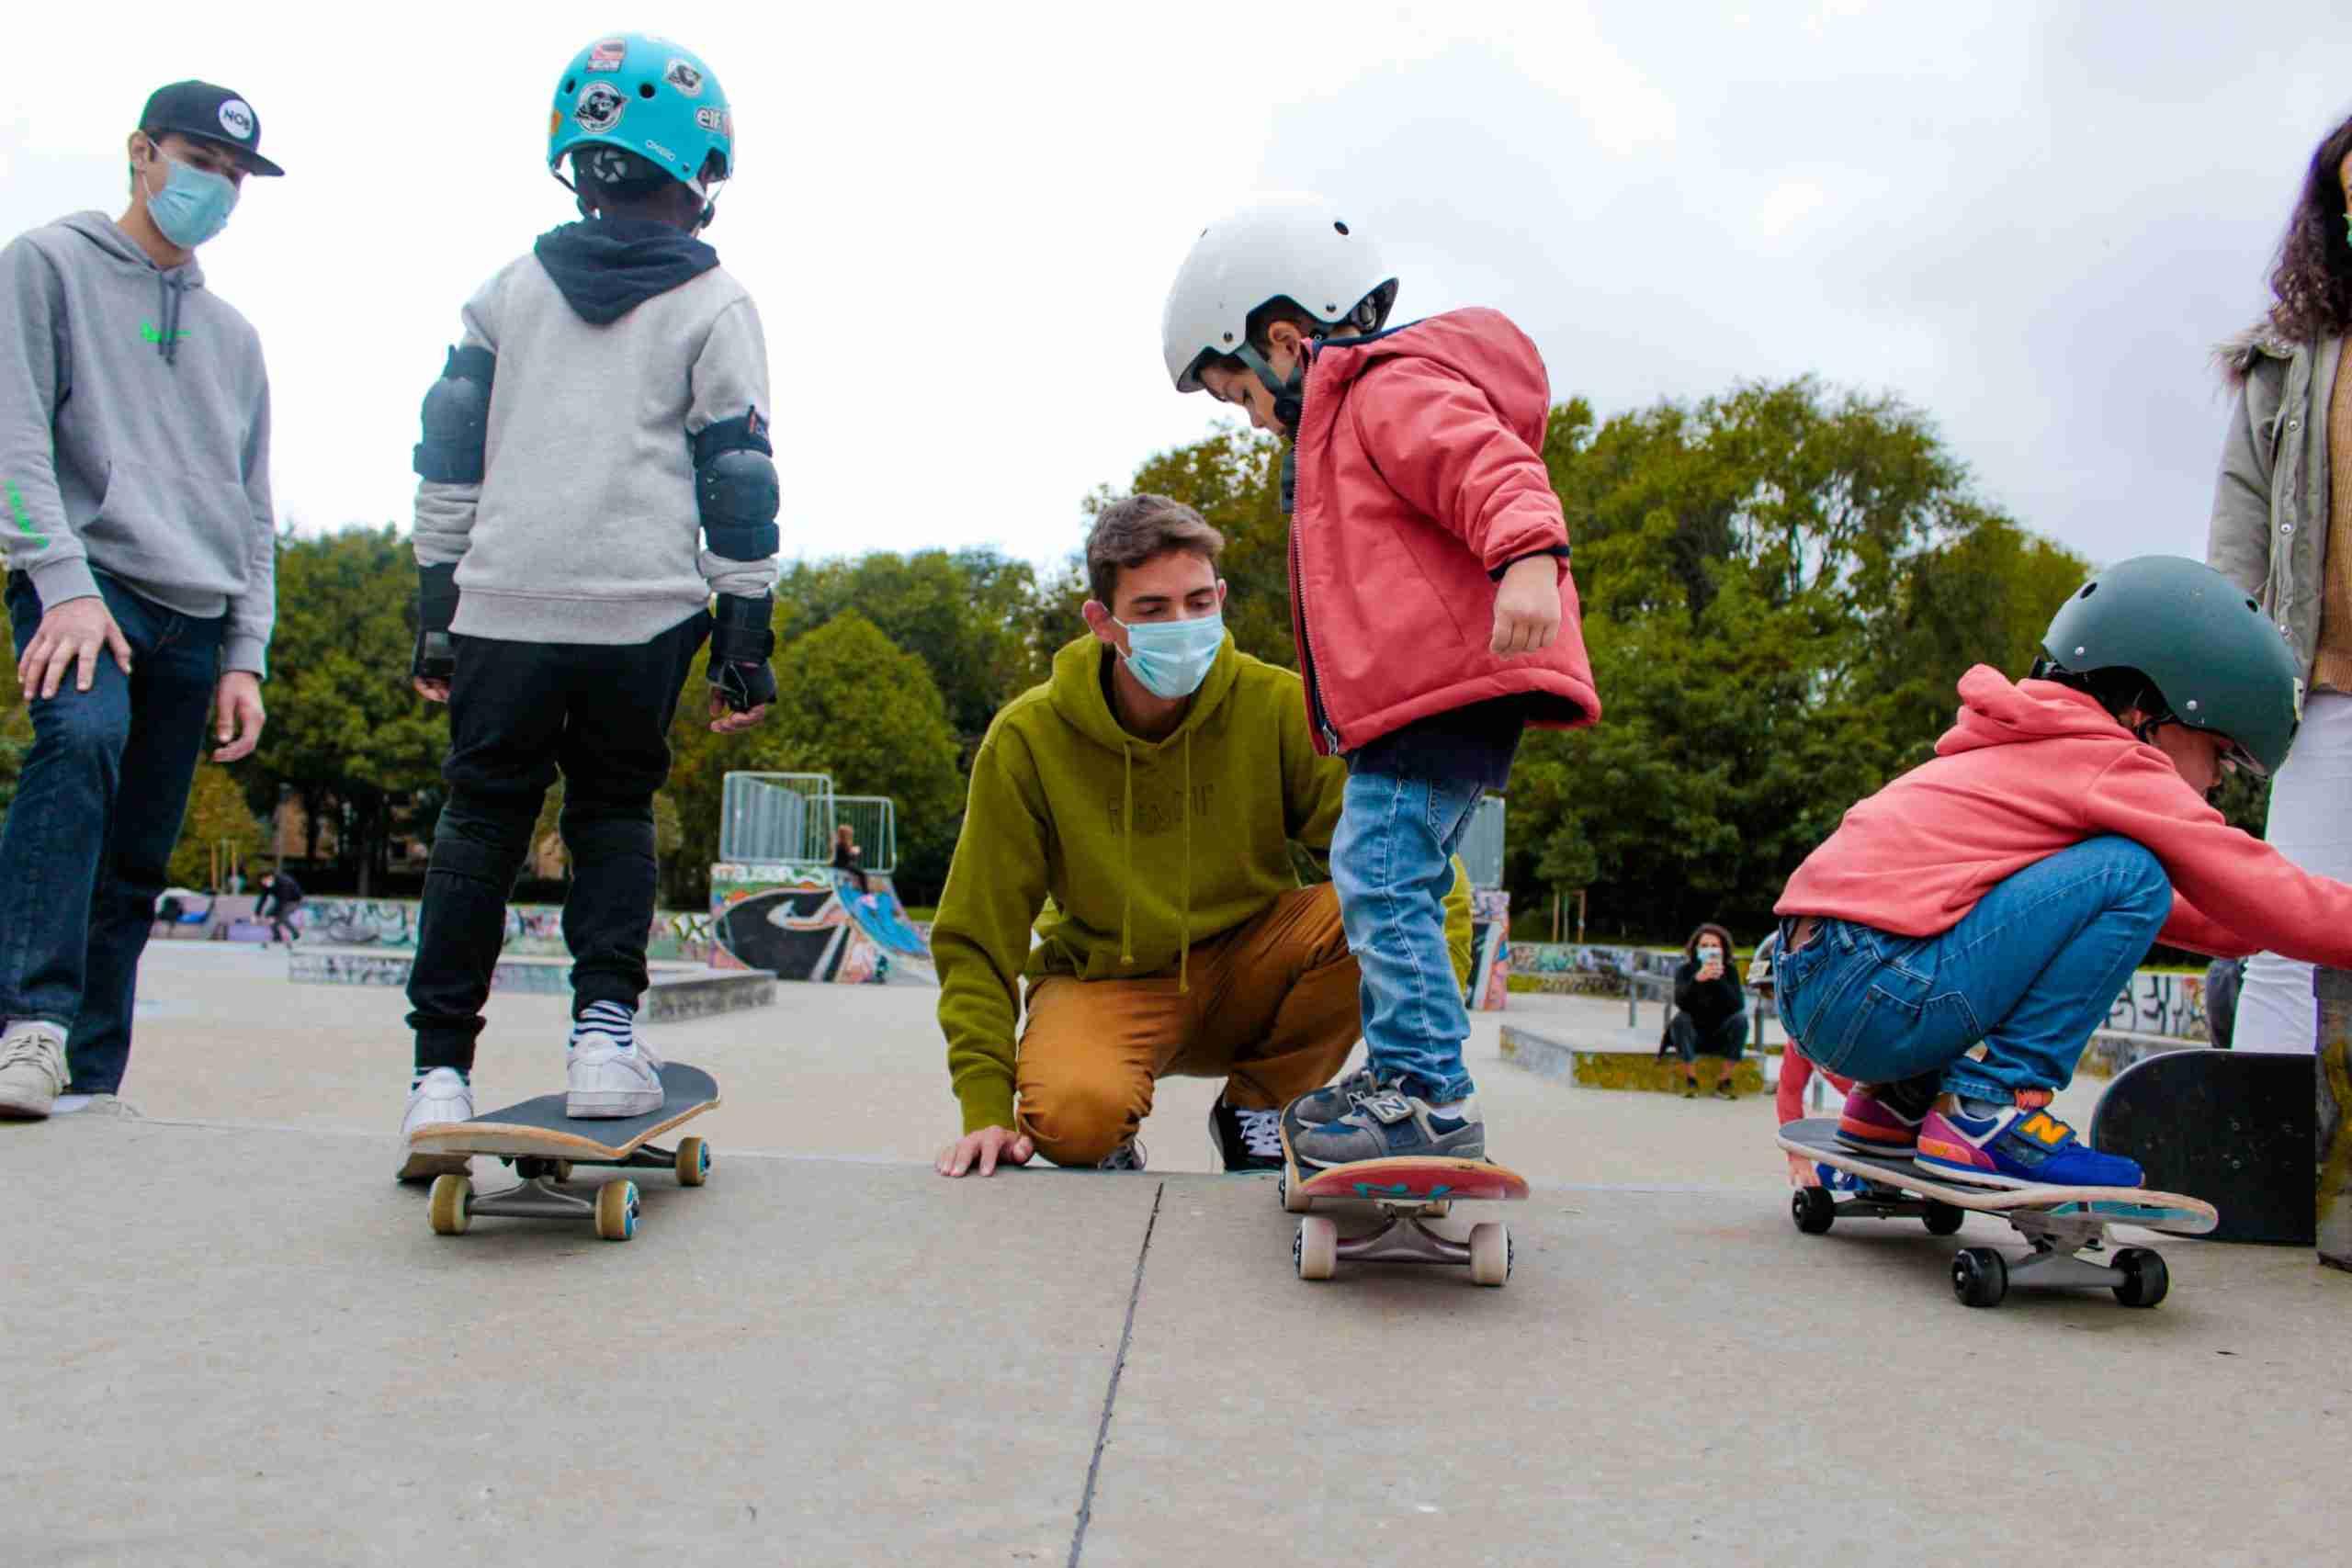 Lezione di skateboard